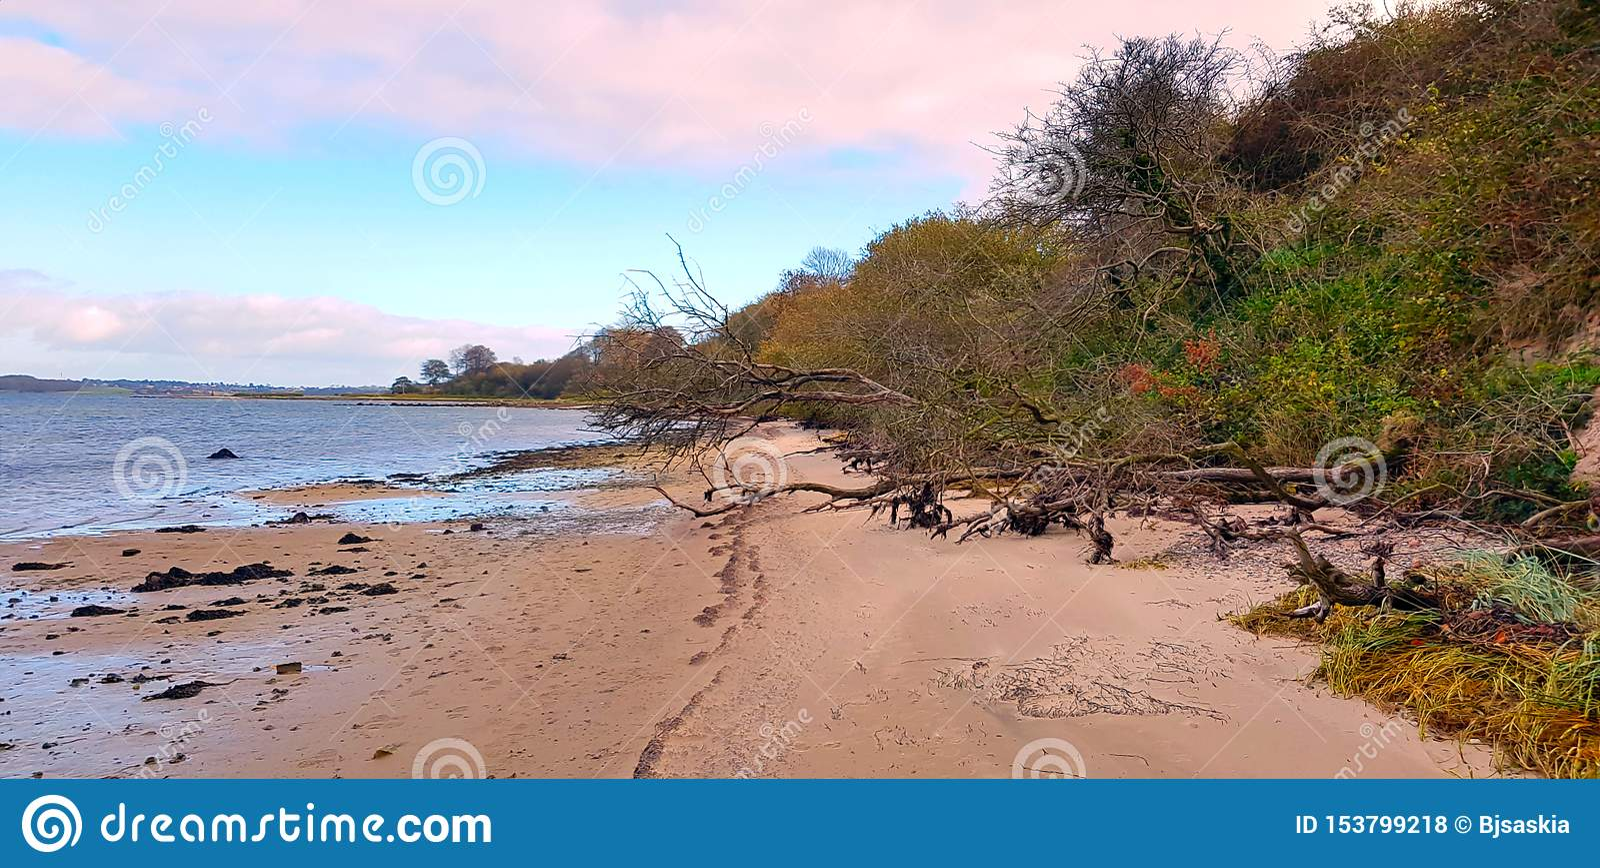 Wilde strandidylle